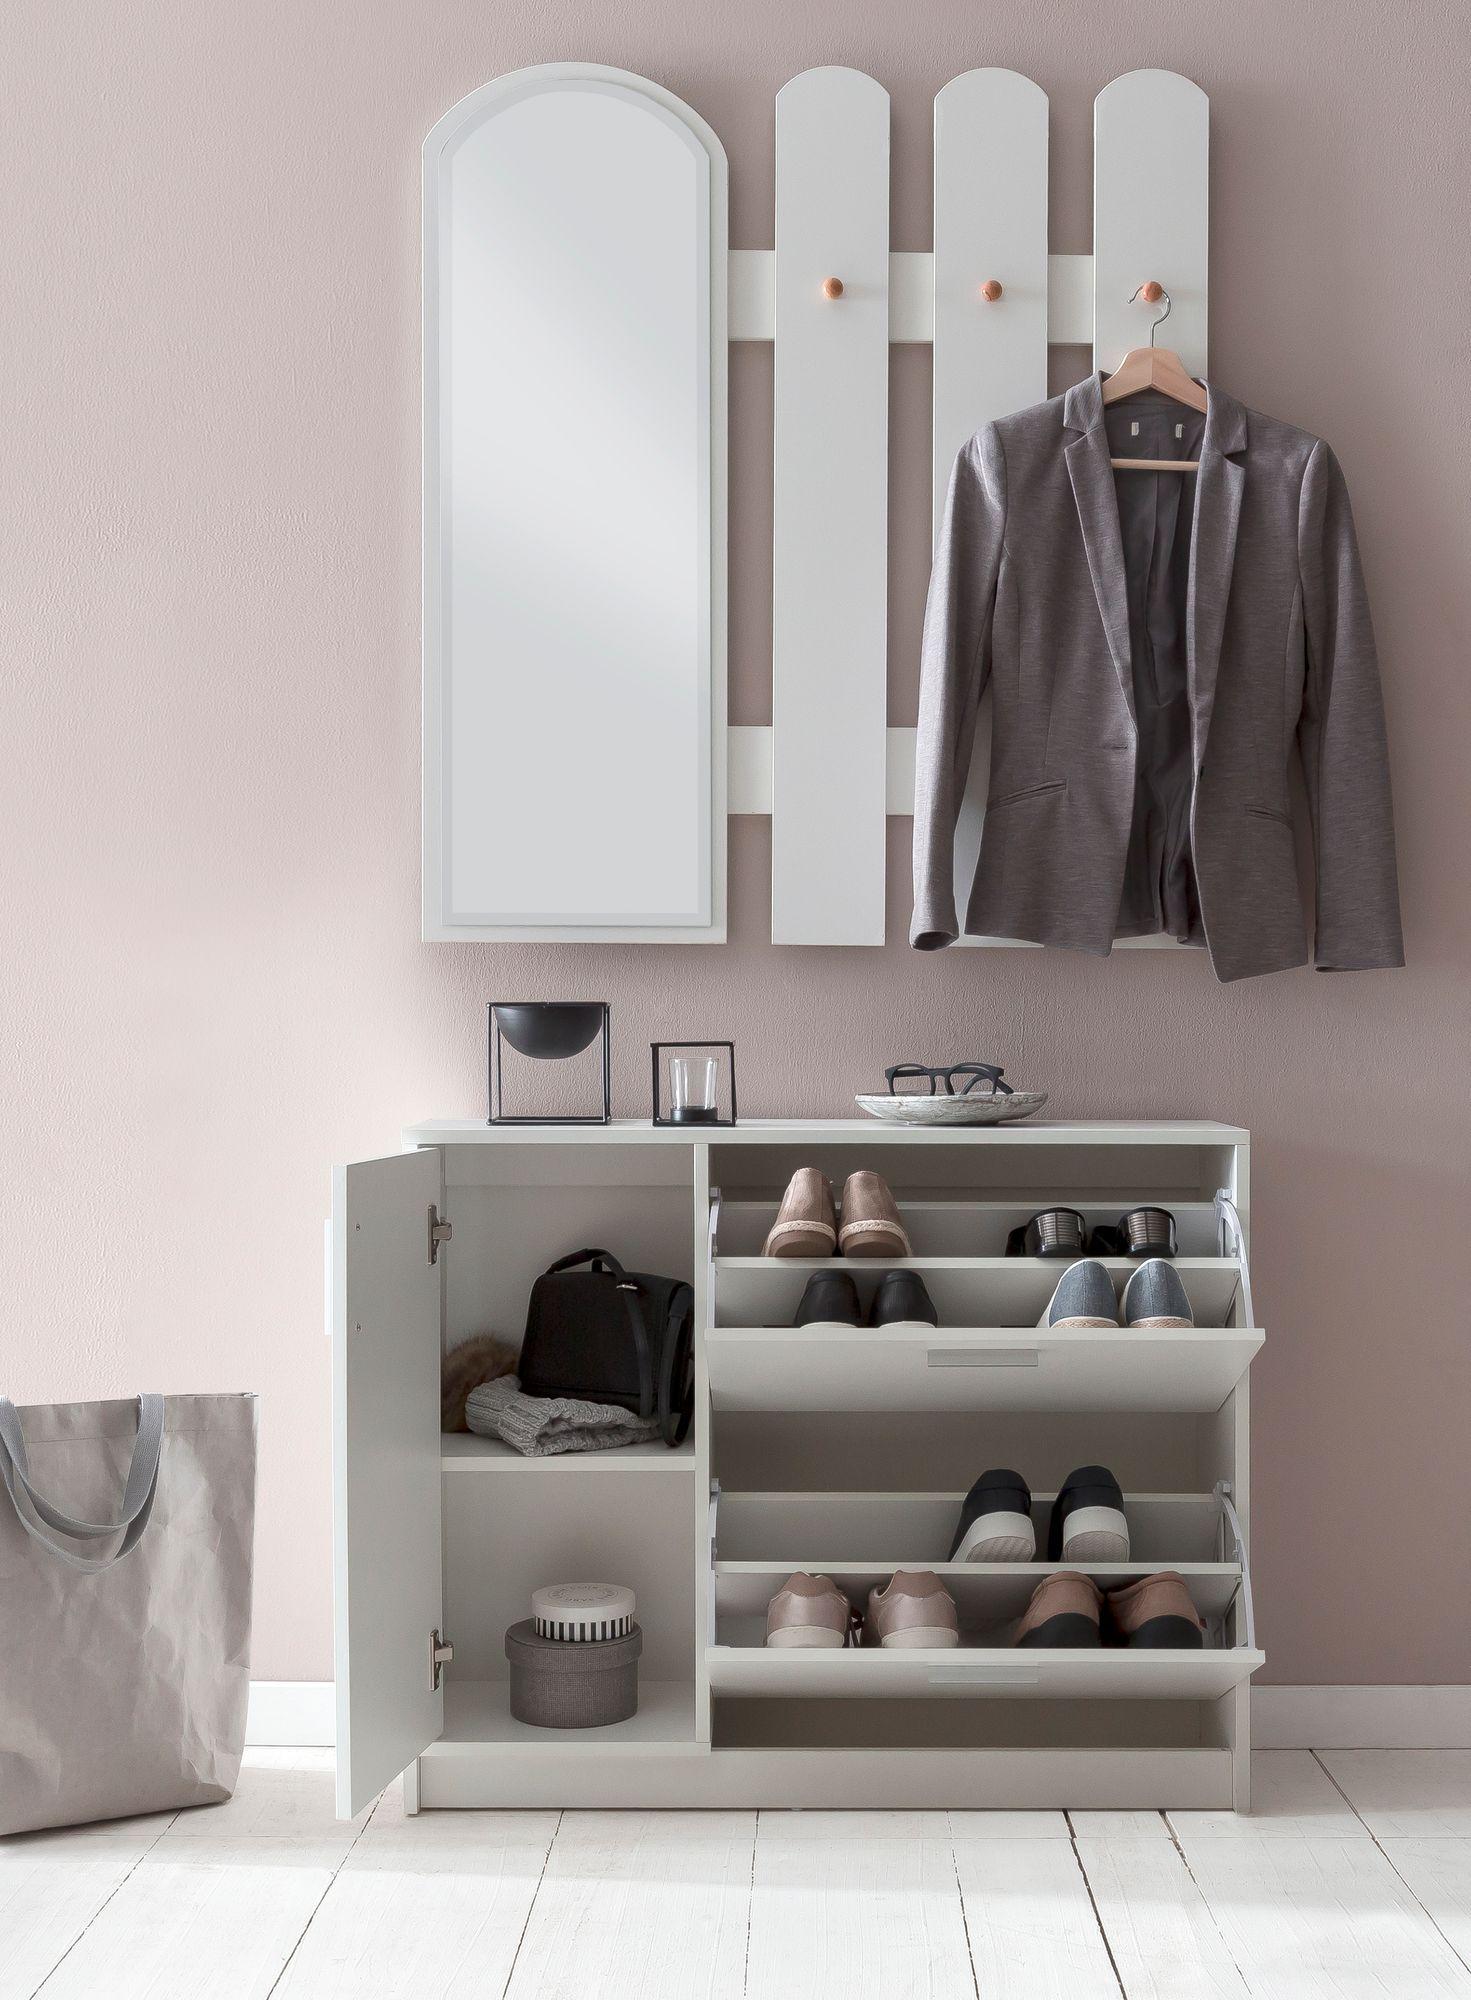 Häufig WOHNLING Garderobe WL5.821 Holz 90x172x24 cm Modern Wandgarderobe WZ84